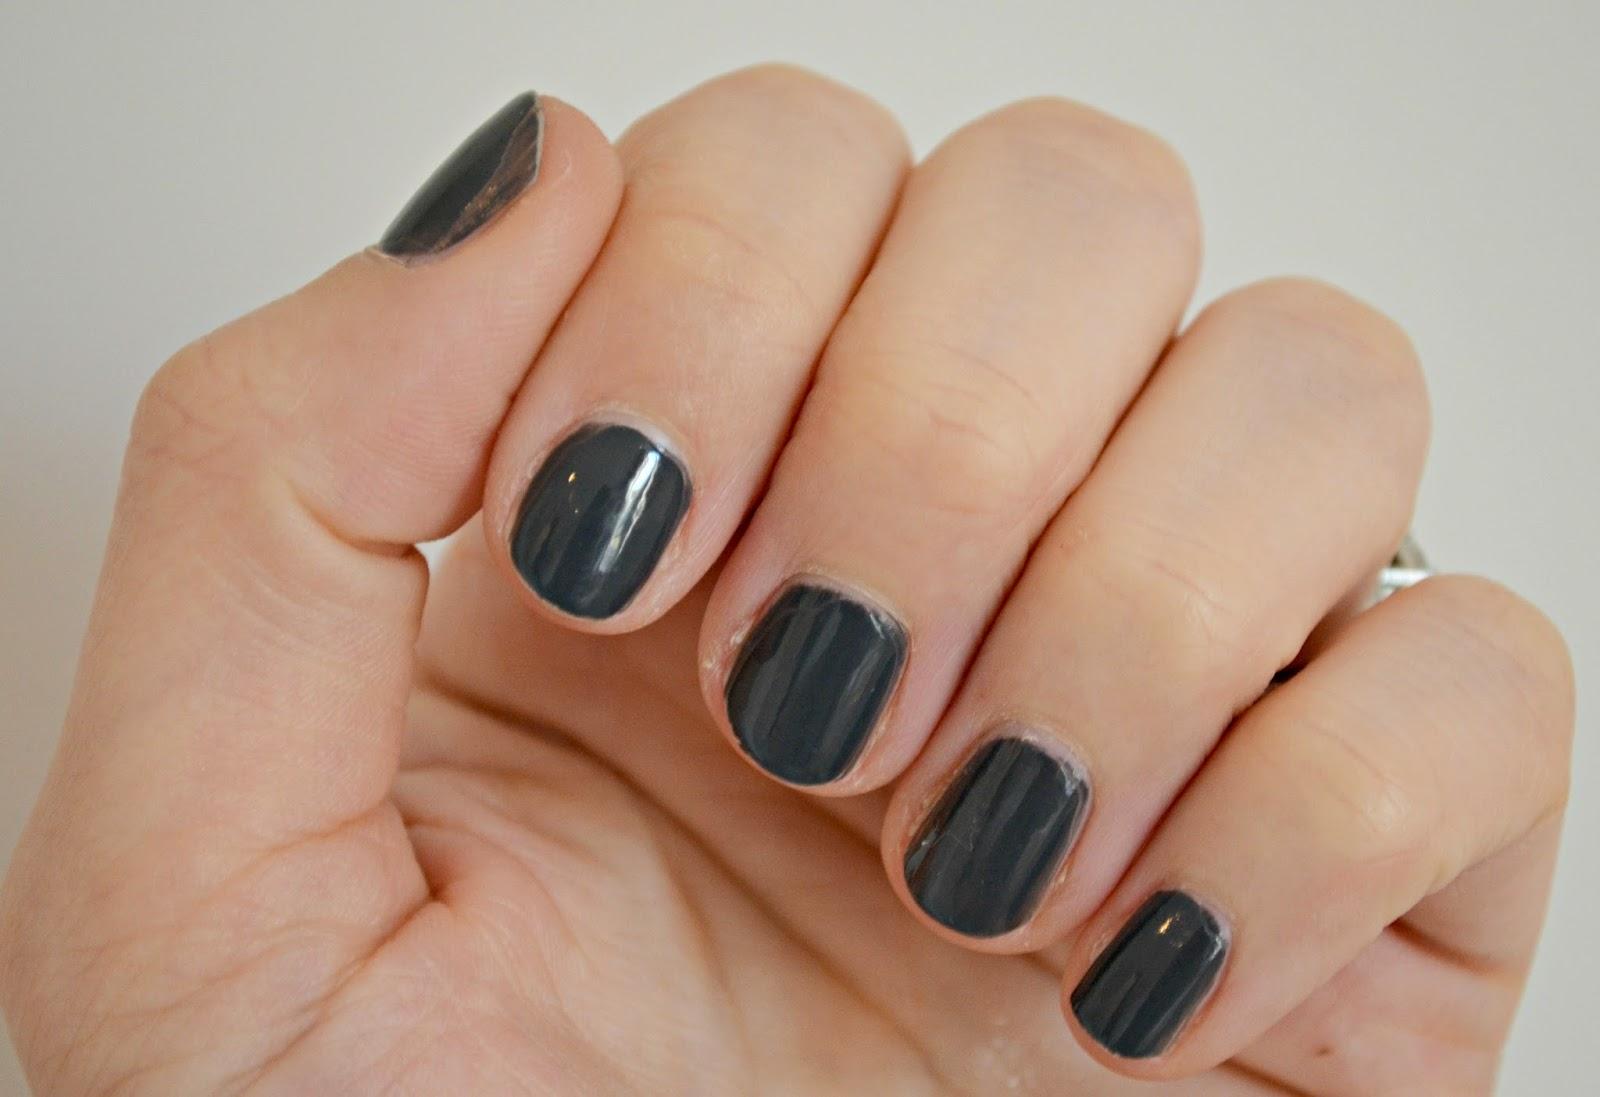 Bourjois Grey To Meet You nails